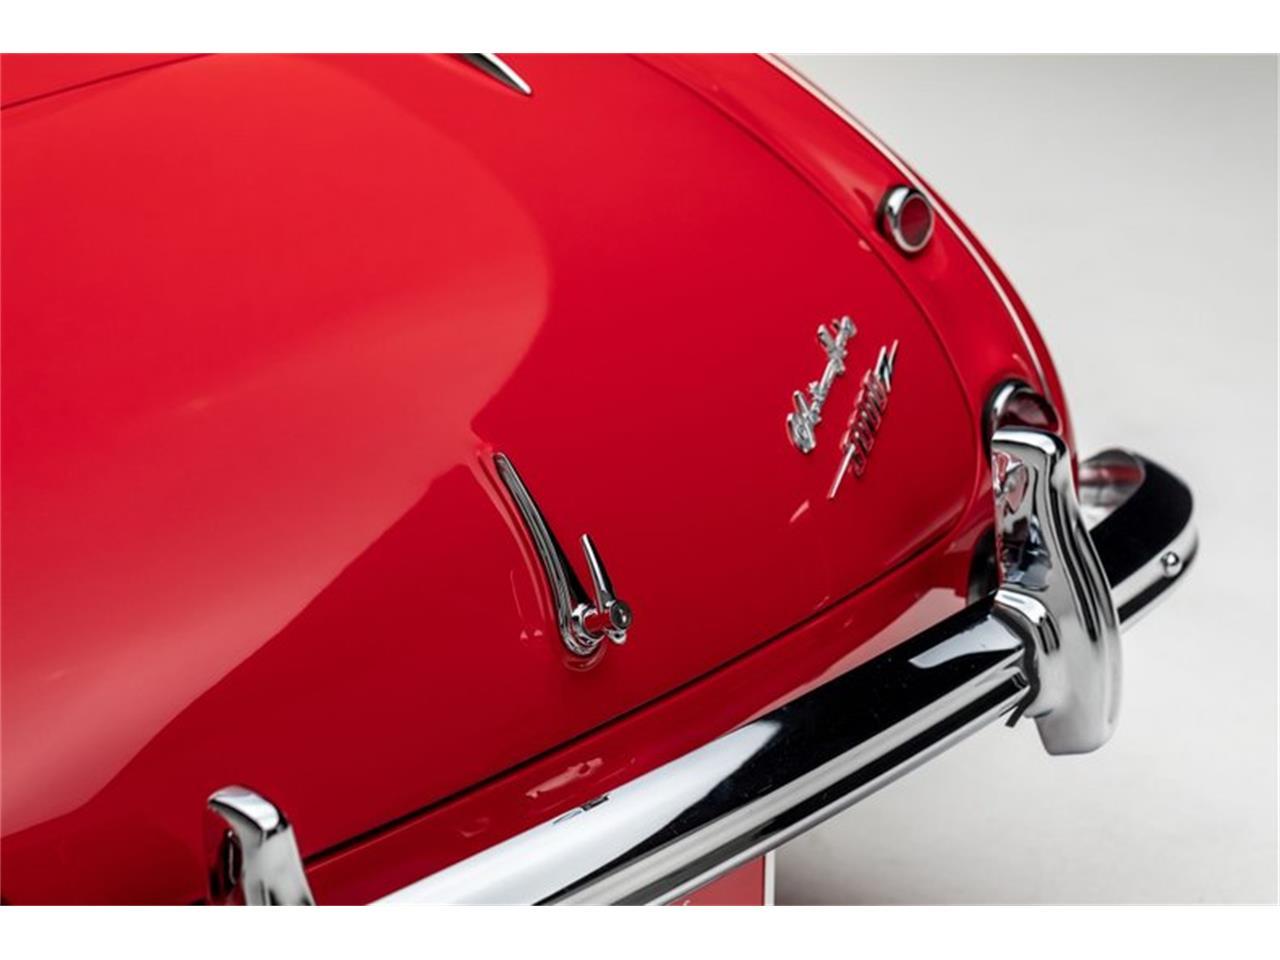 1963 Austin-Healey 3000 (CC-1345384) for sale in Costa Mesa, California